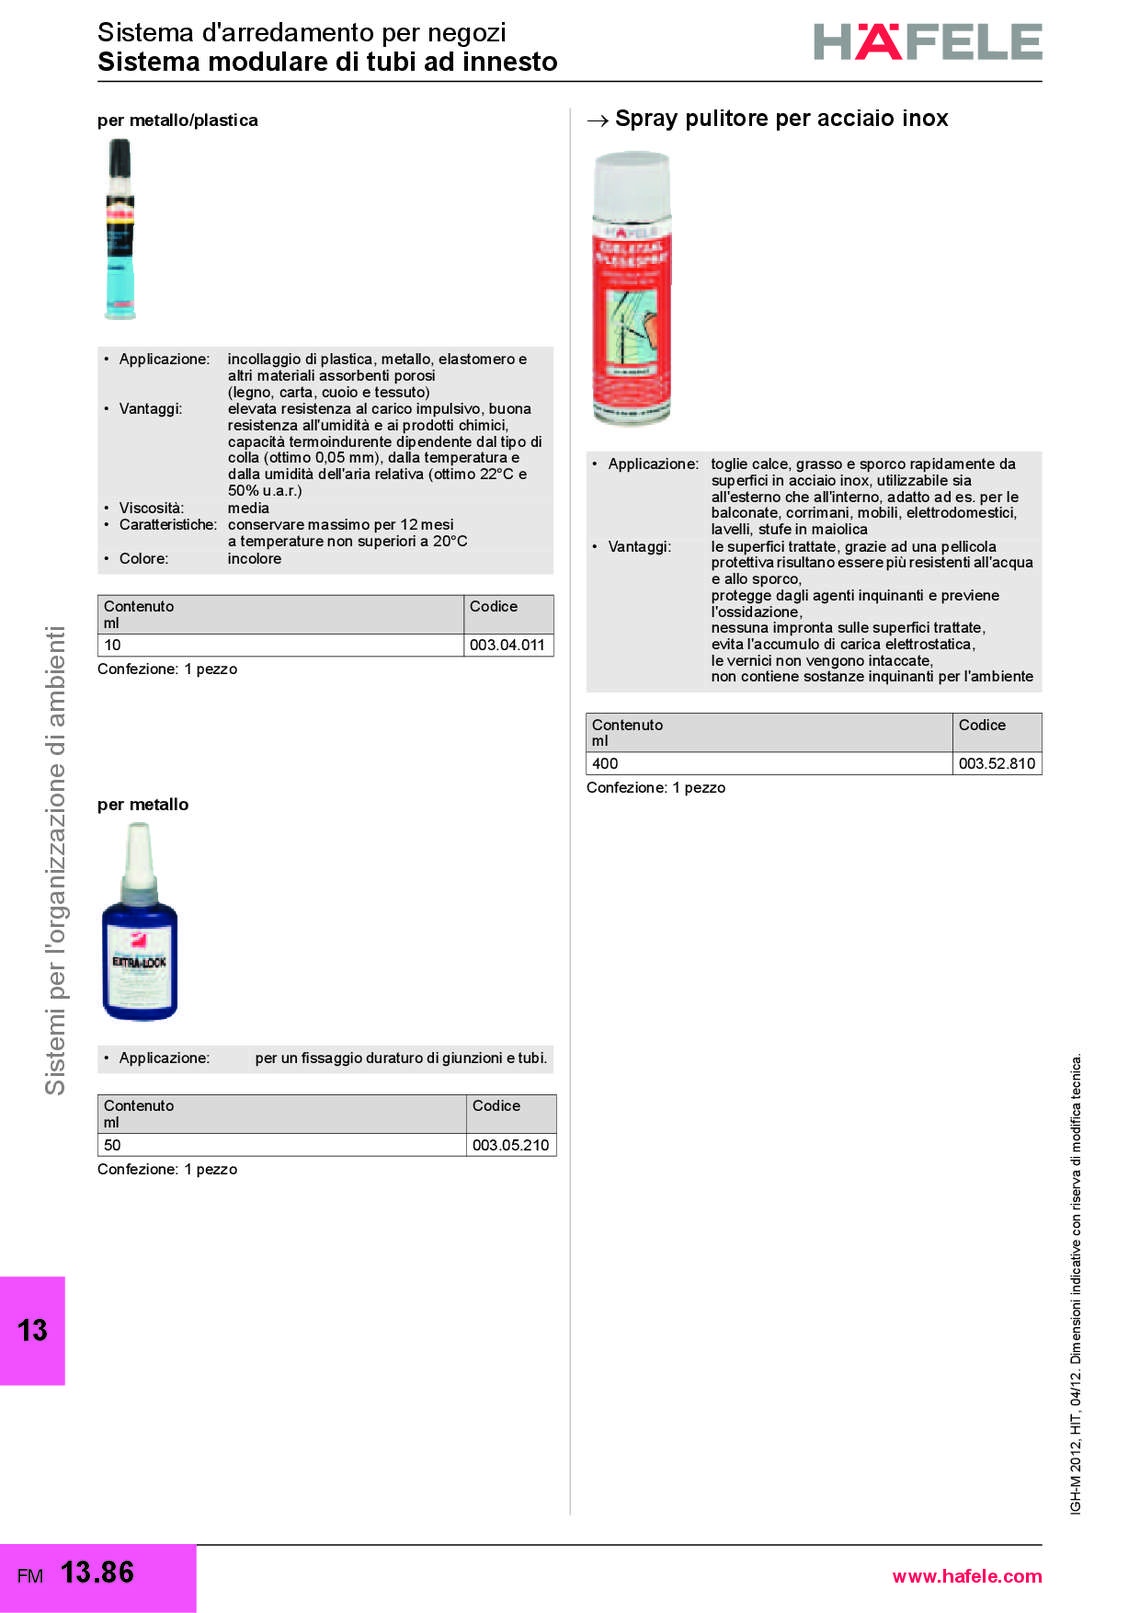 hafele-arredo-negozi-e-farmacie_32_097.jpg